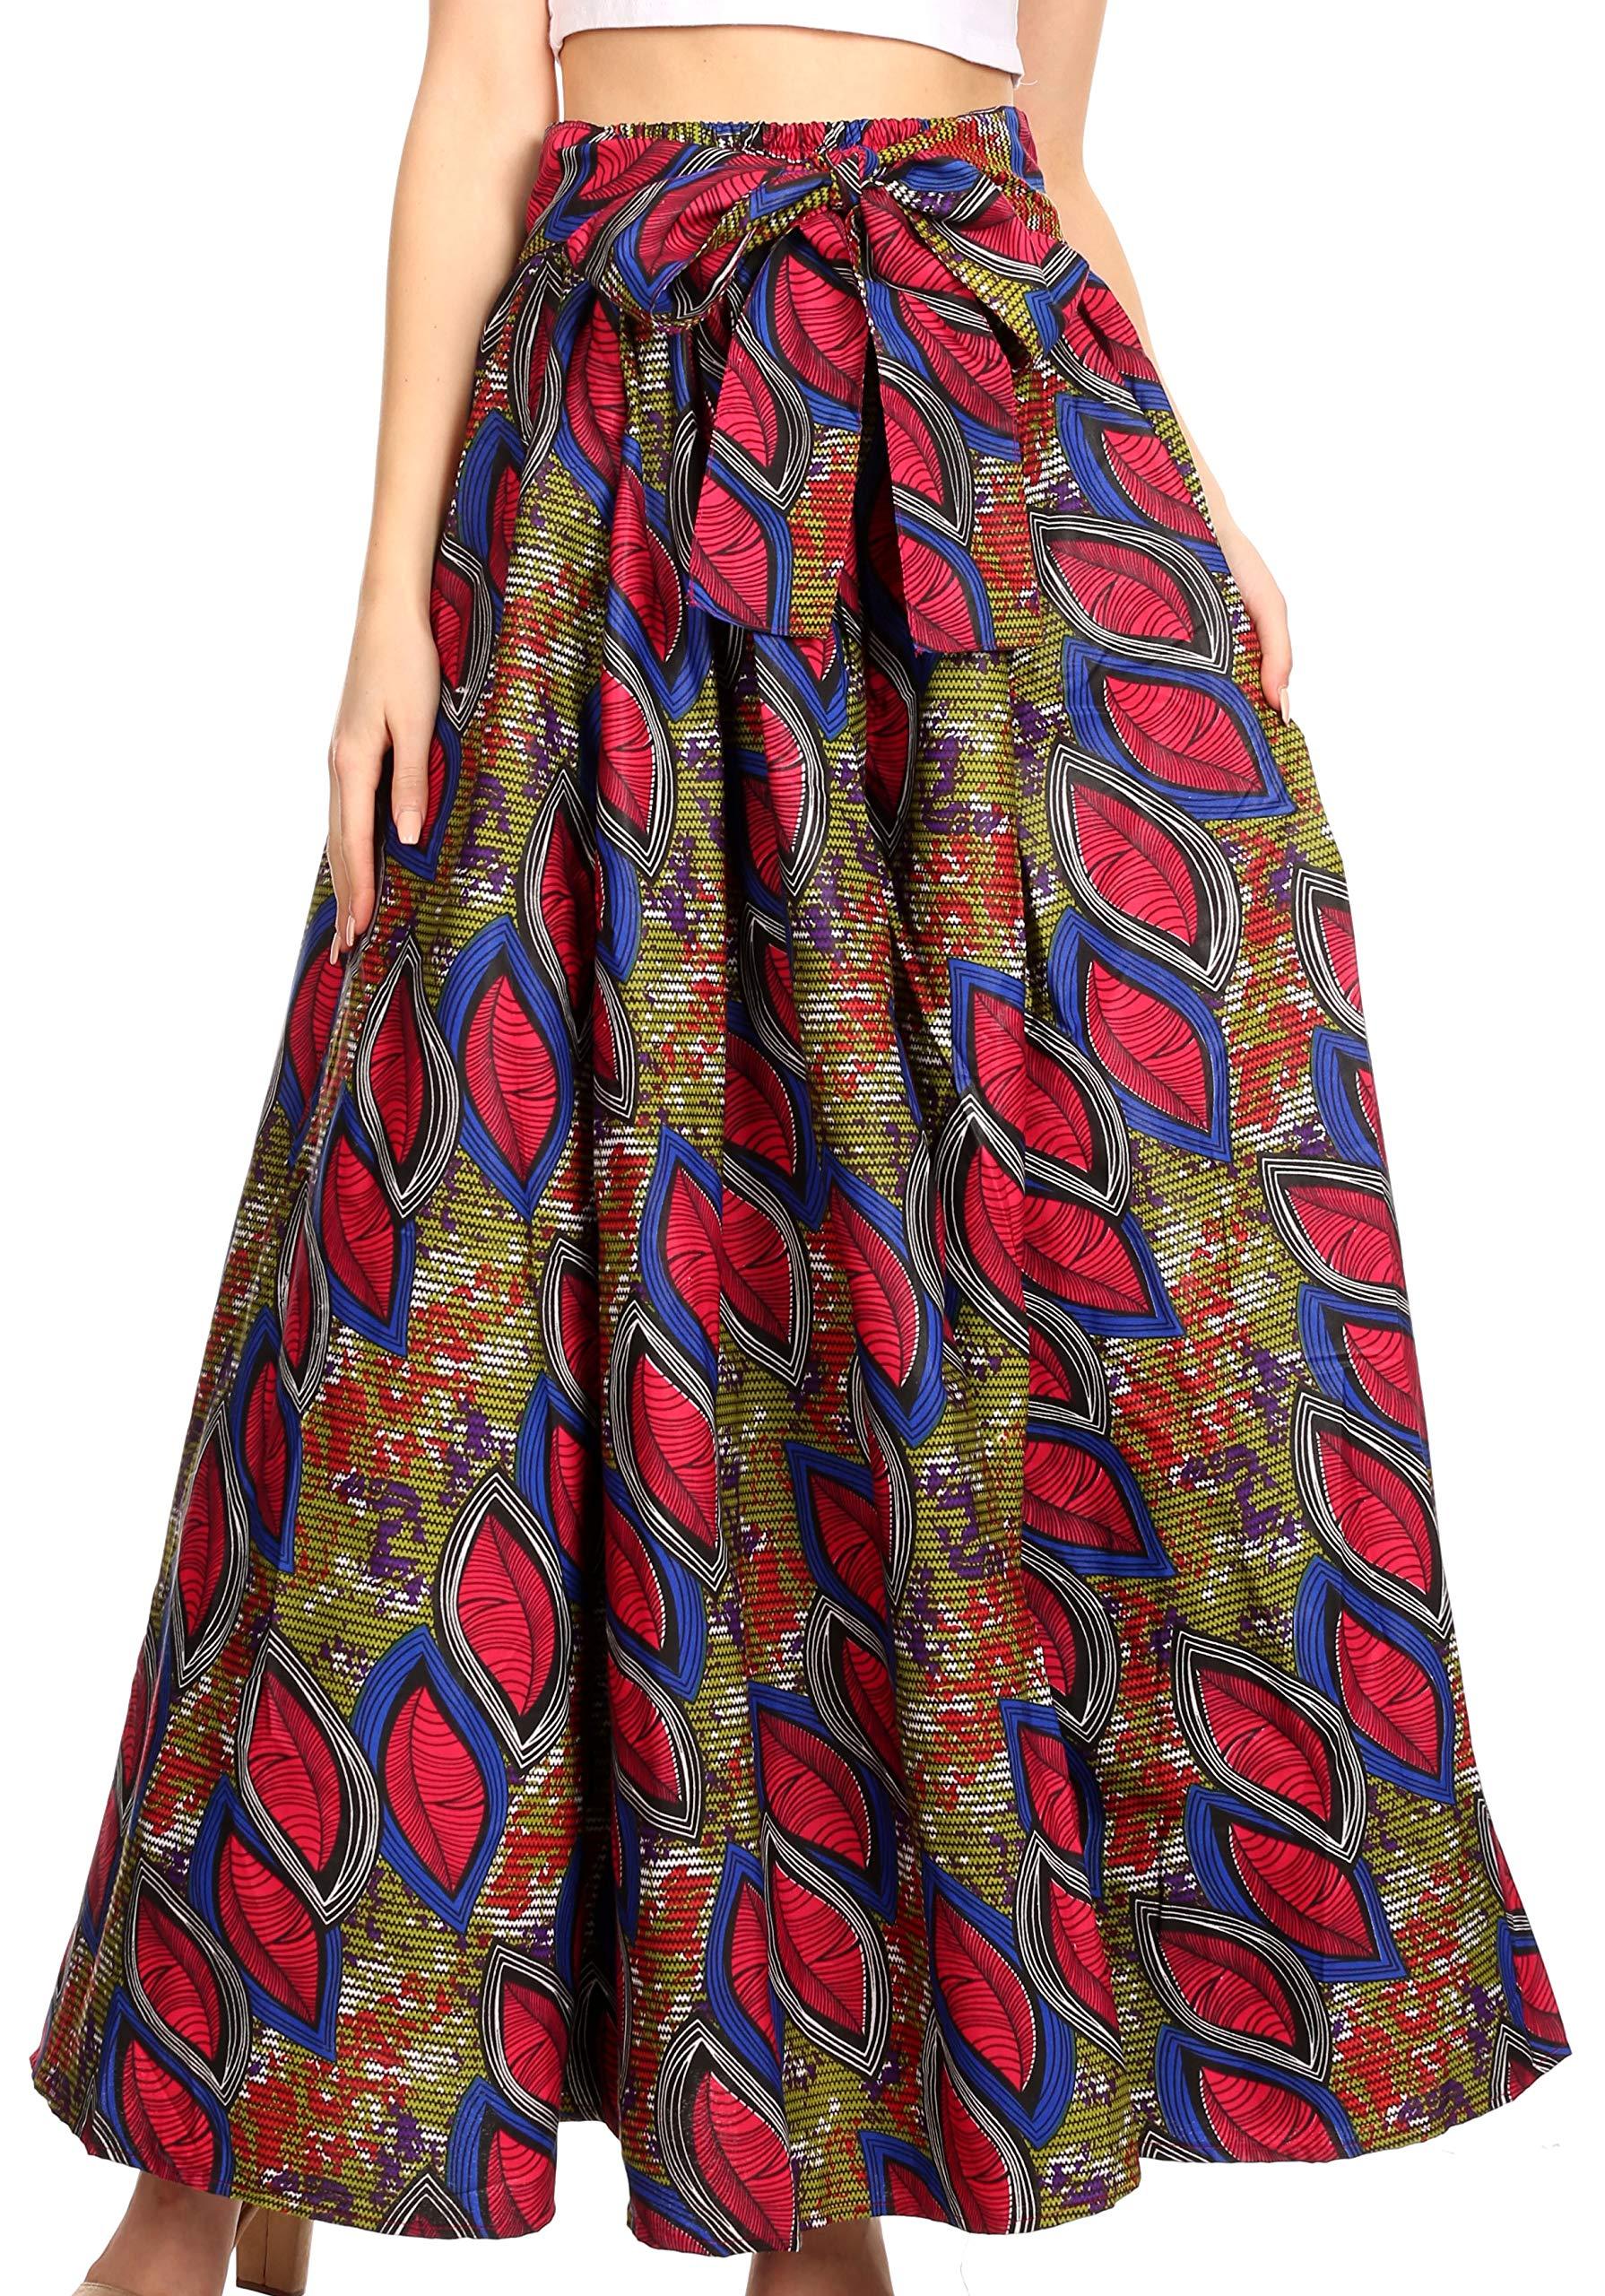 Sakkas 19417 - Ami Women's Maxi Long African Ankara Print Skirt Pockets & Elastic Waist - 121-RoyalCranberryMulti - OS